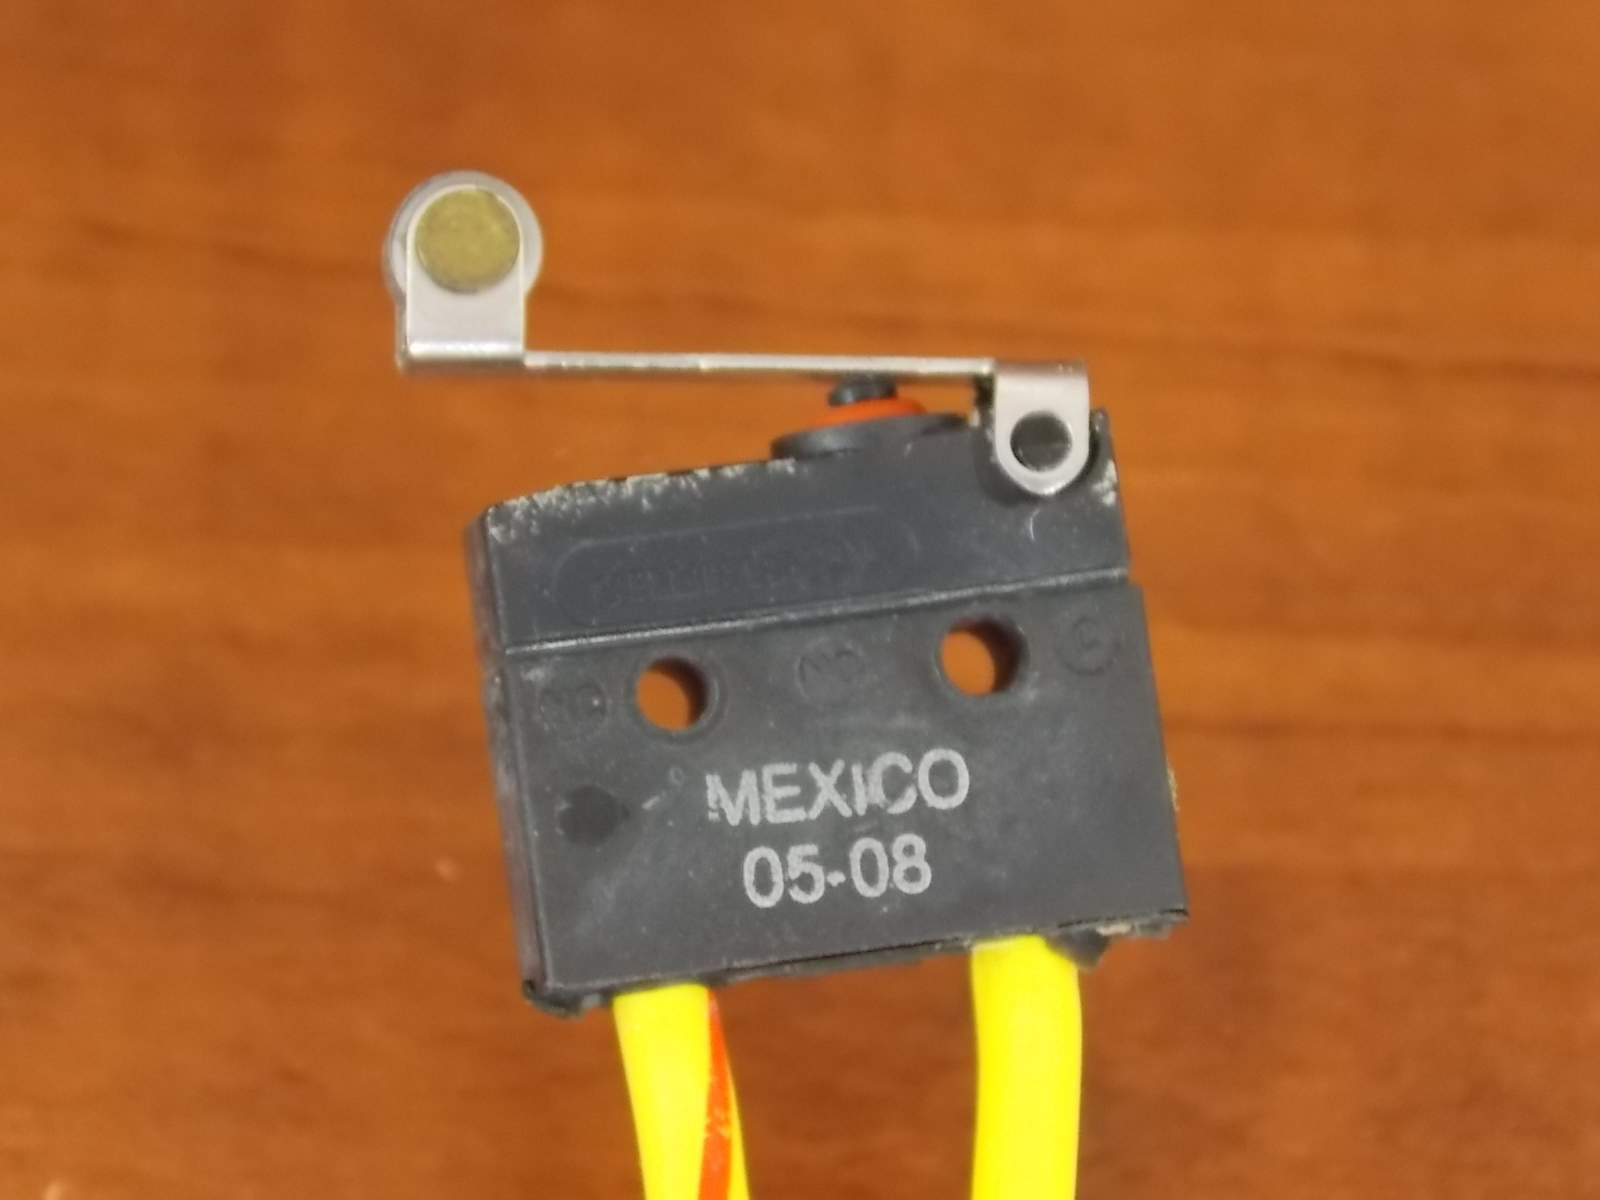 Johnson Omc Control Box Parts : Omc johnson evinrude control box switch and cable